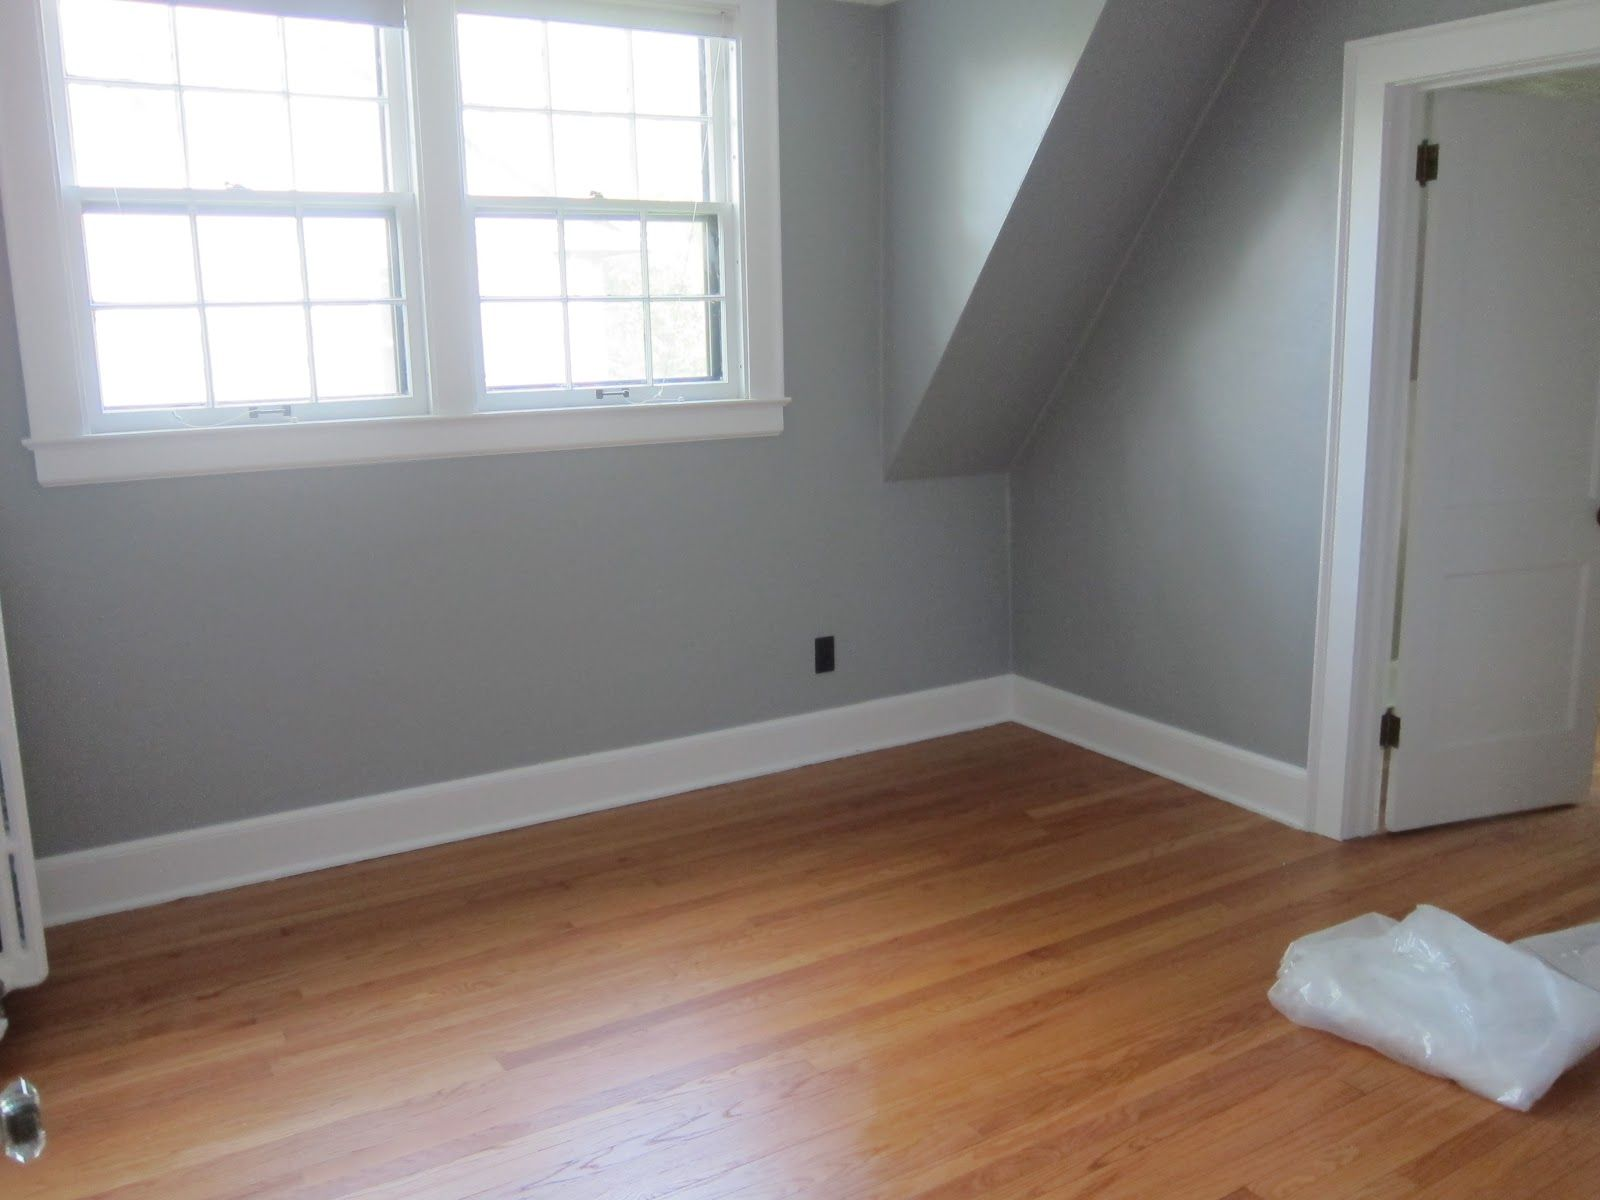 behr sparrow Living room grey, Boy room paint